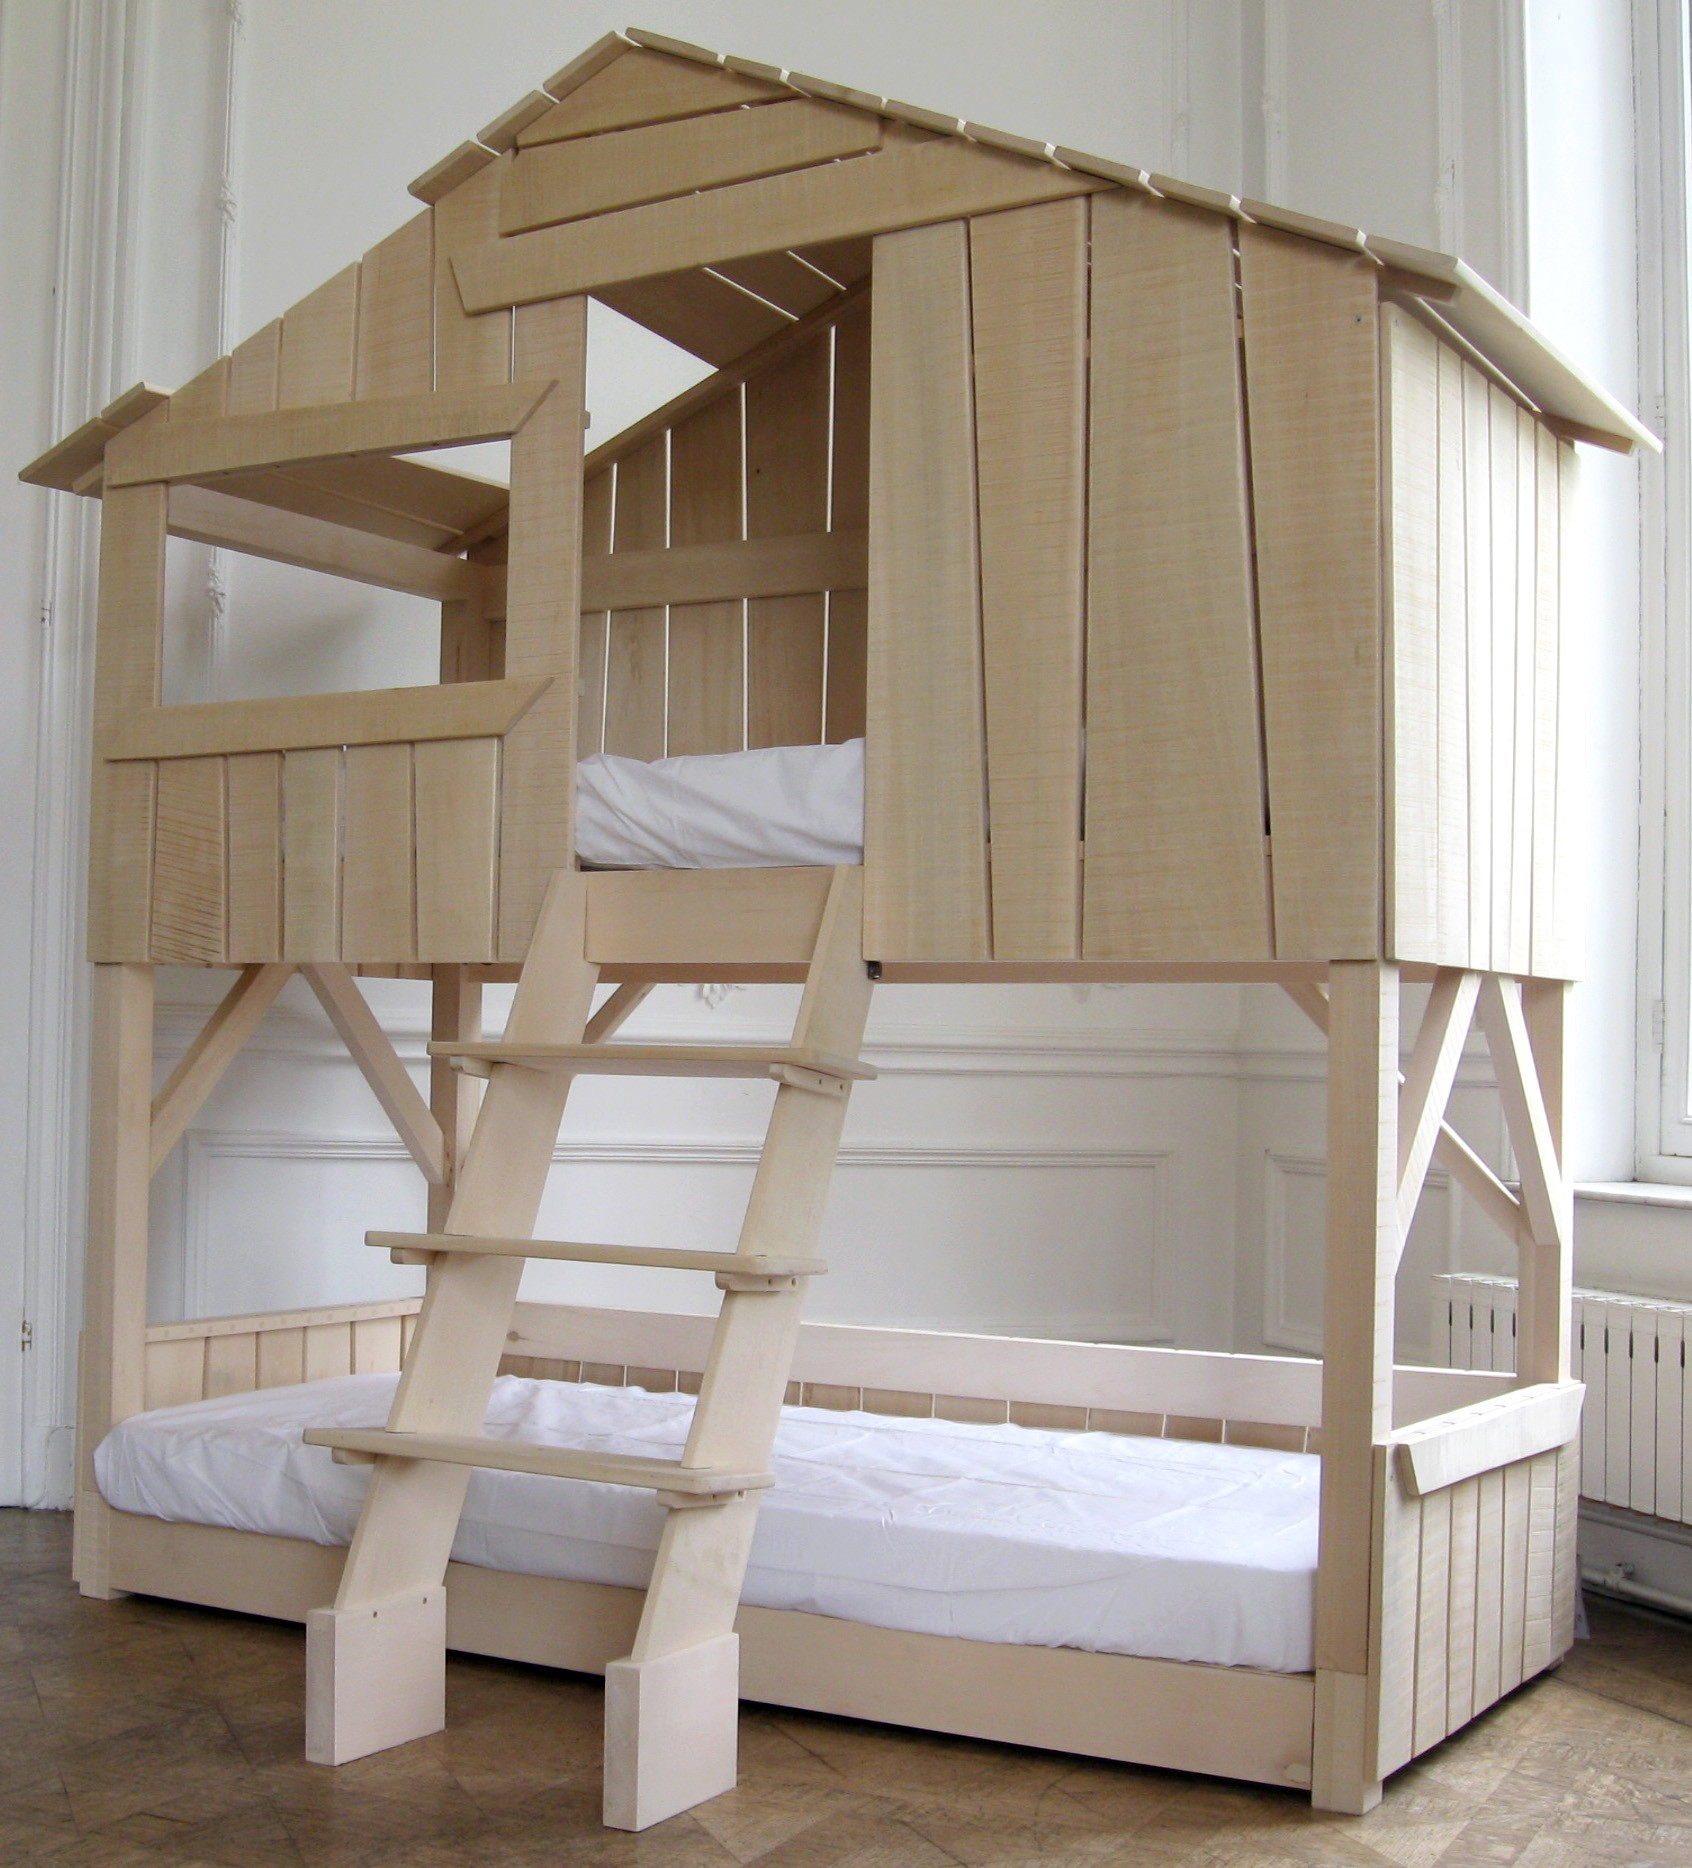 lit cabane enfant double couchage. Black Bedroom Furniture Sets. Home Design Ideas